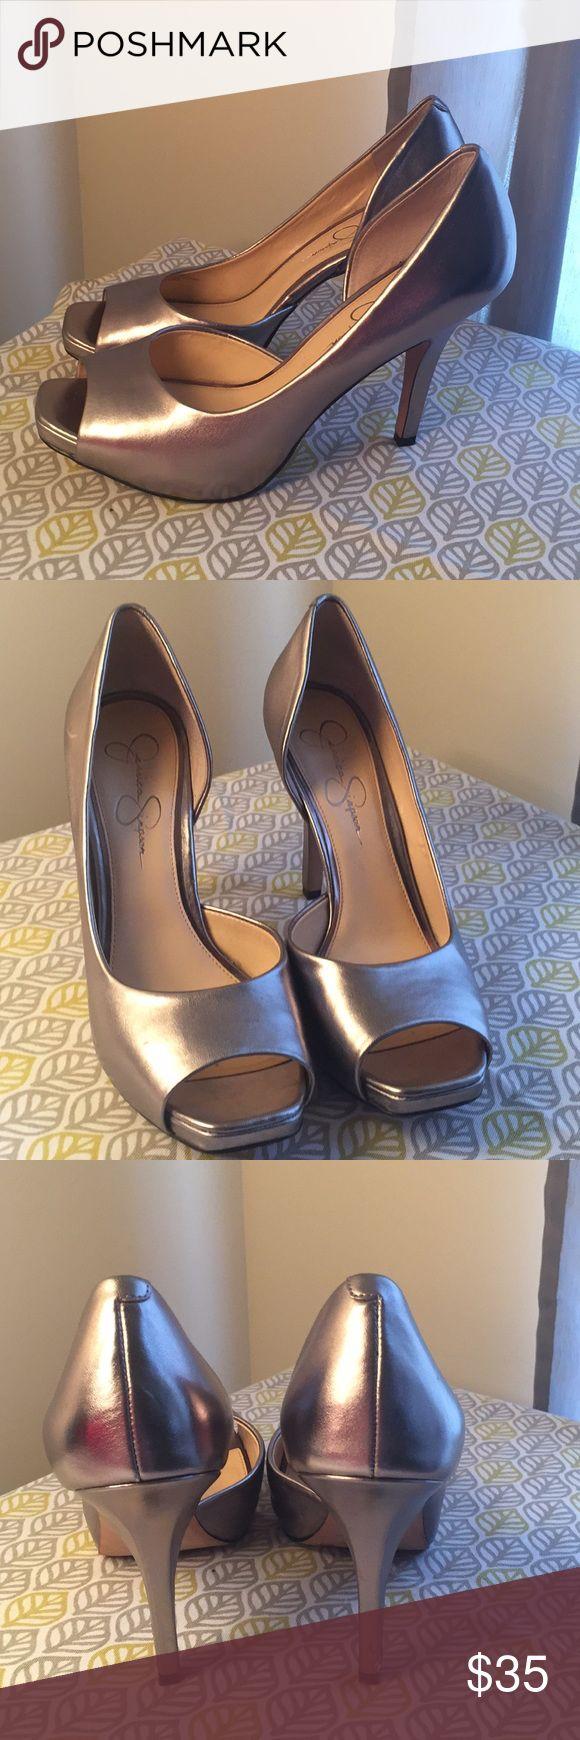 Jessica Simpson Pumps New Metallic Open Toe Jessica Simpson Shoes Heels